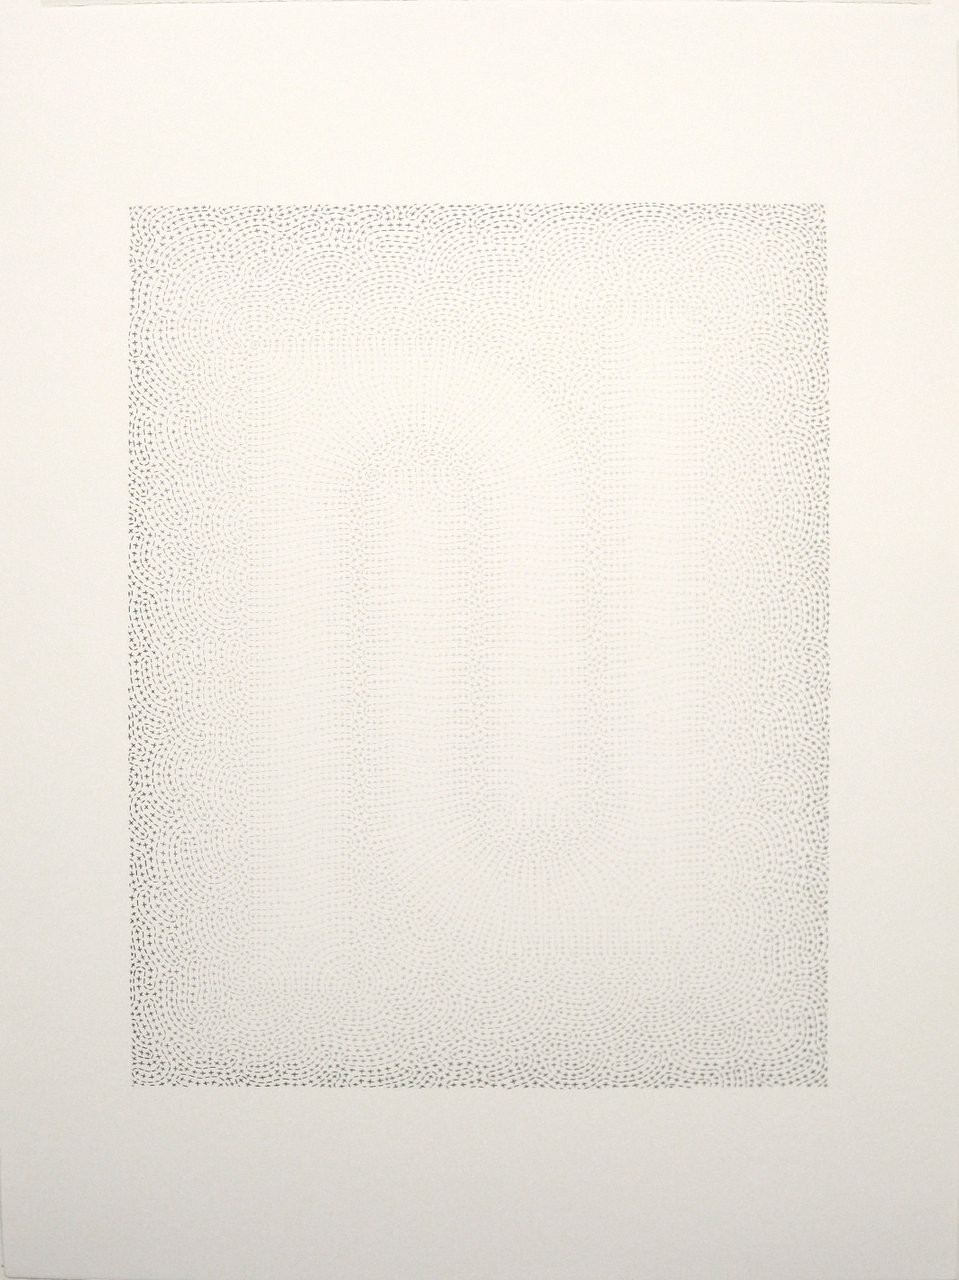 ILS, Pencil on paper, 700 mm x 500 mm